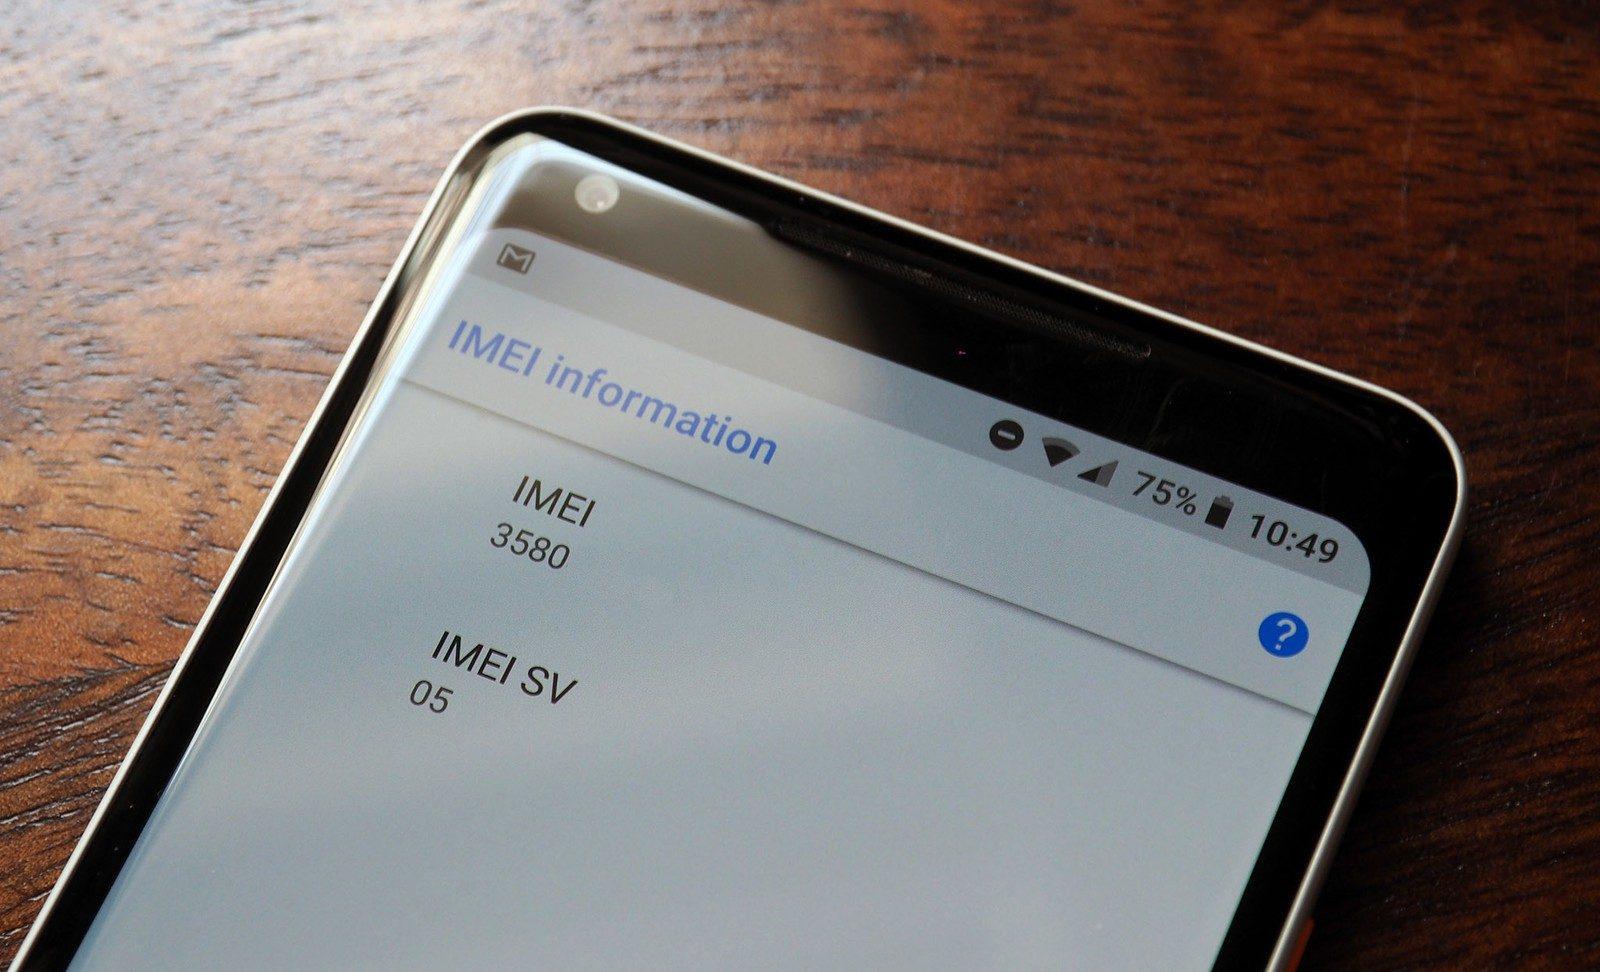 Как посмотреть IMEI на Андроиде